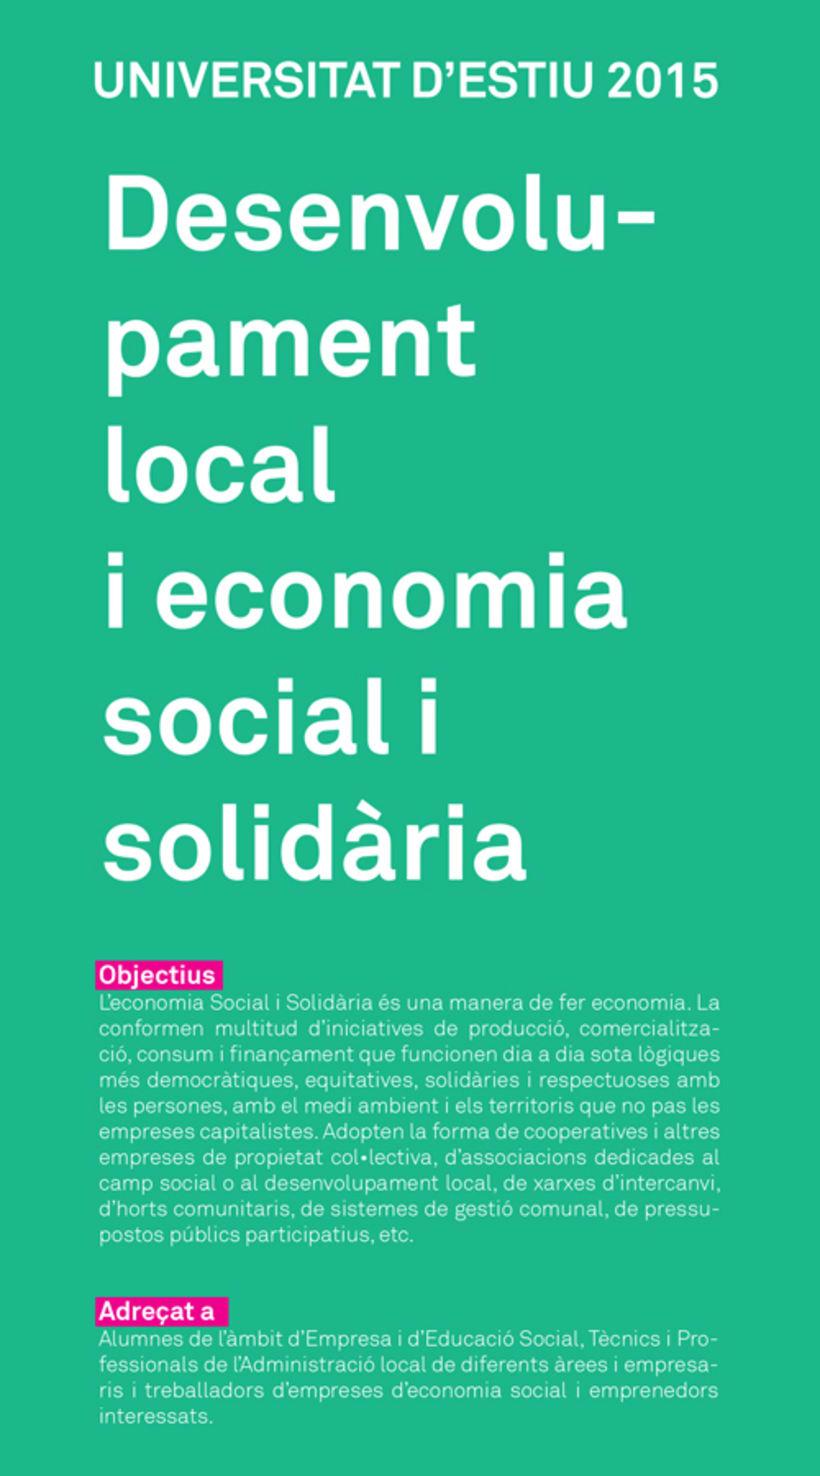 Desenvolupament local i economia social i solidària UVic -1